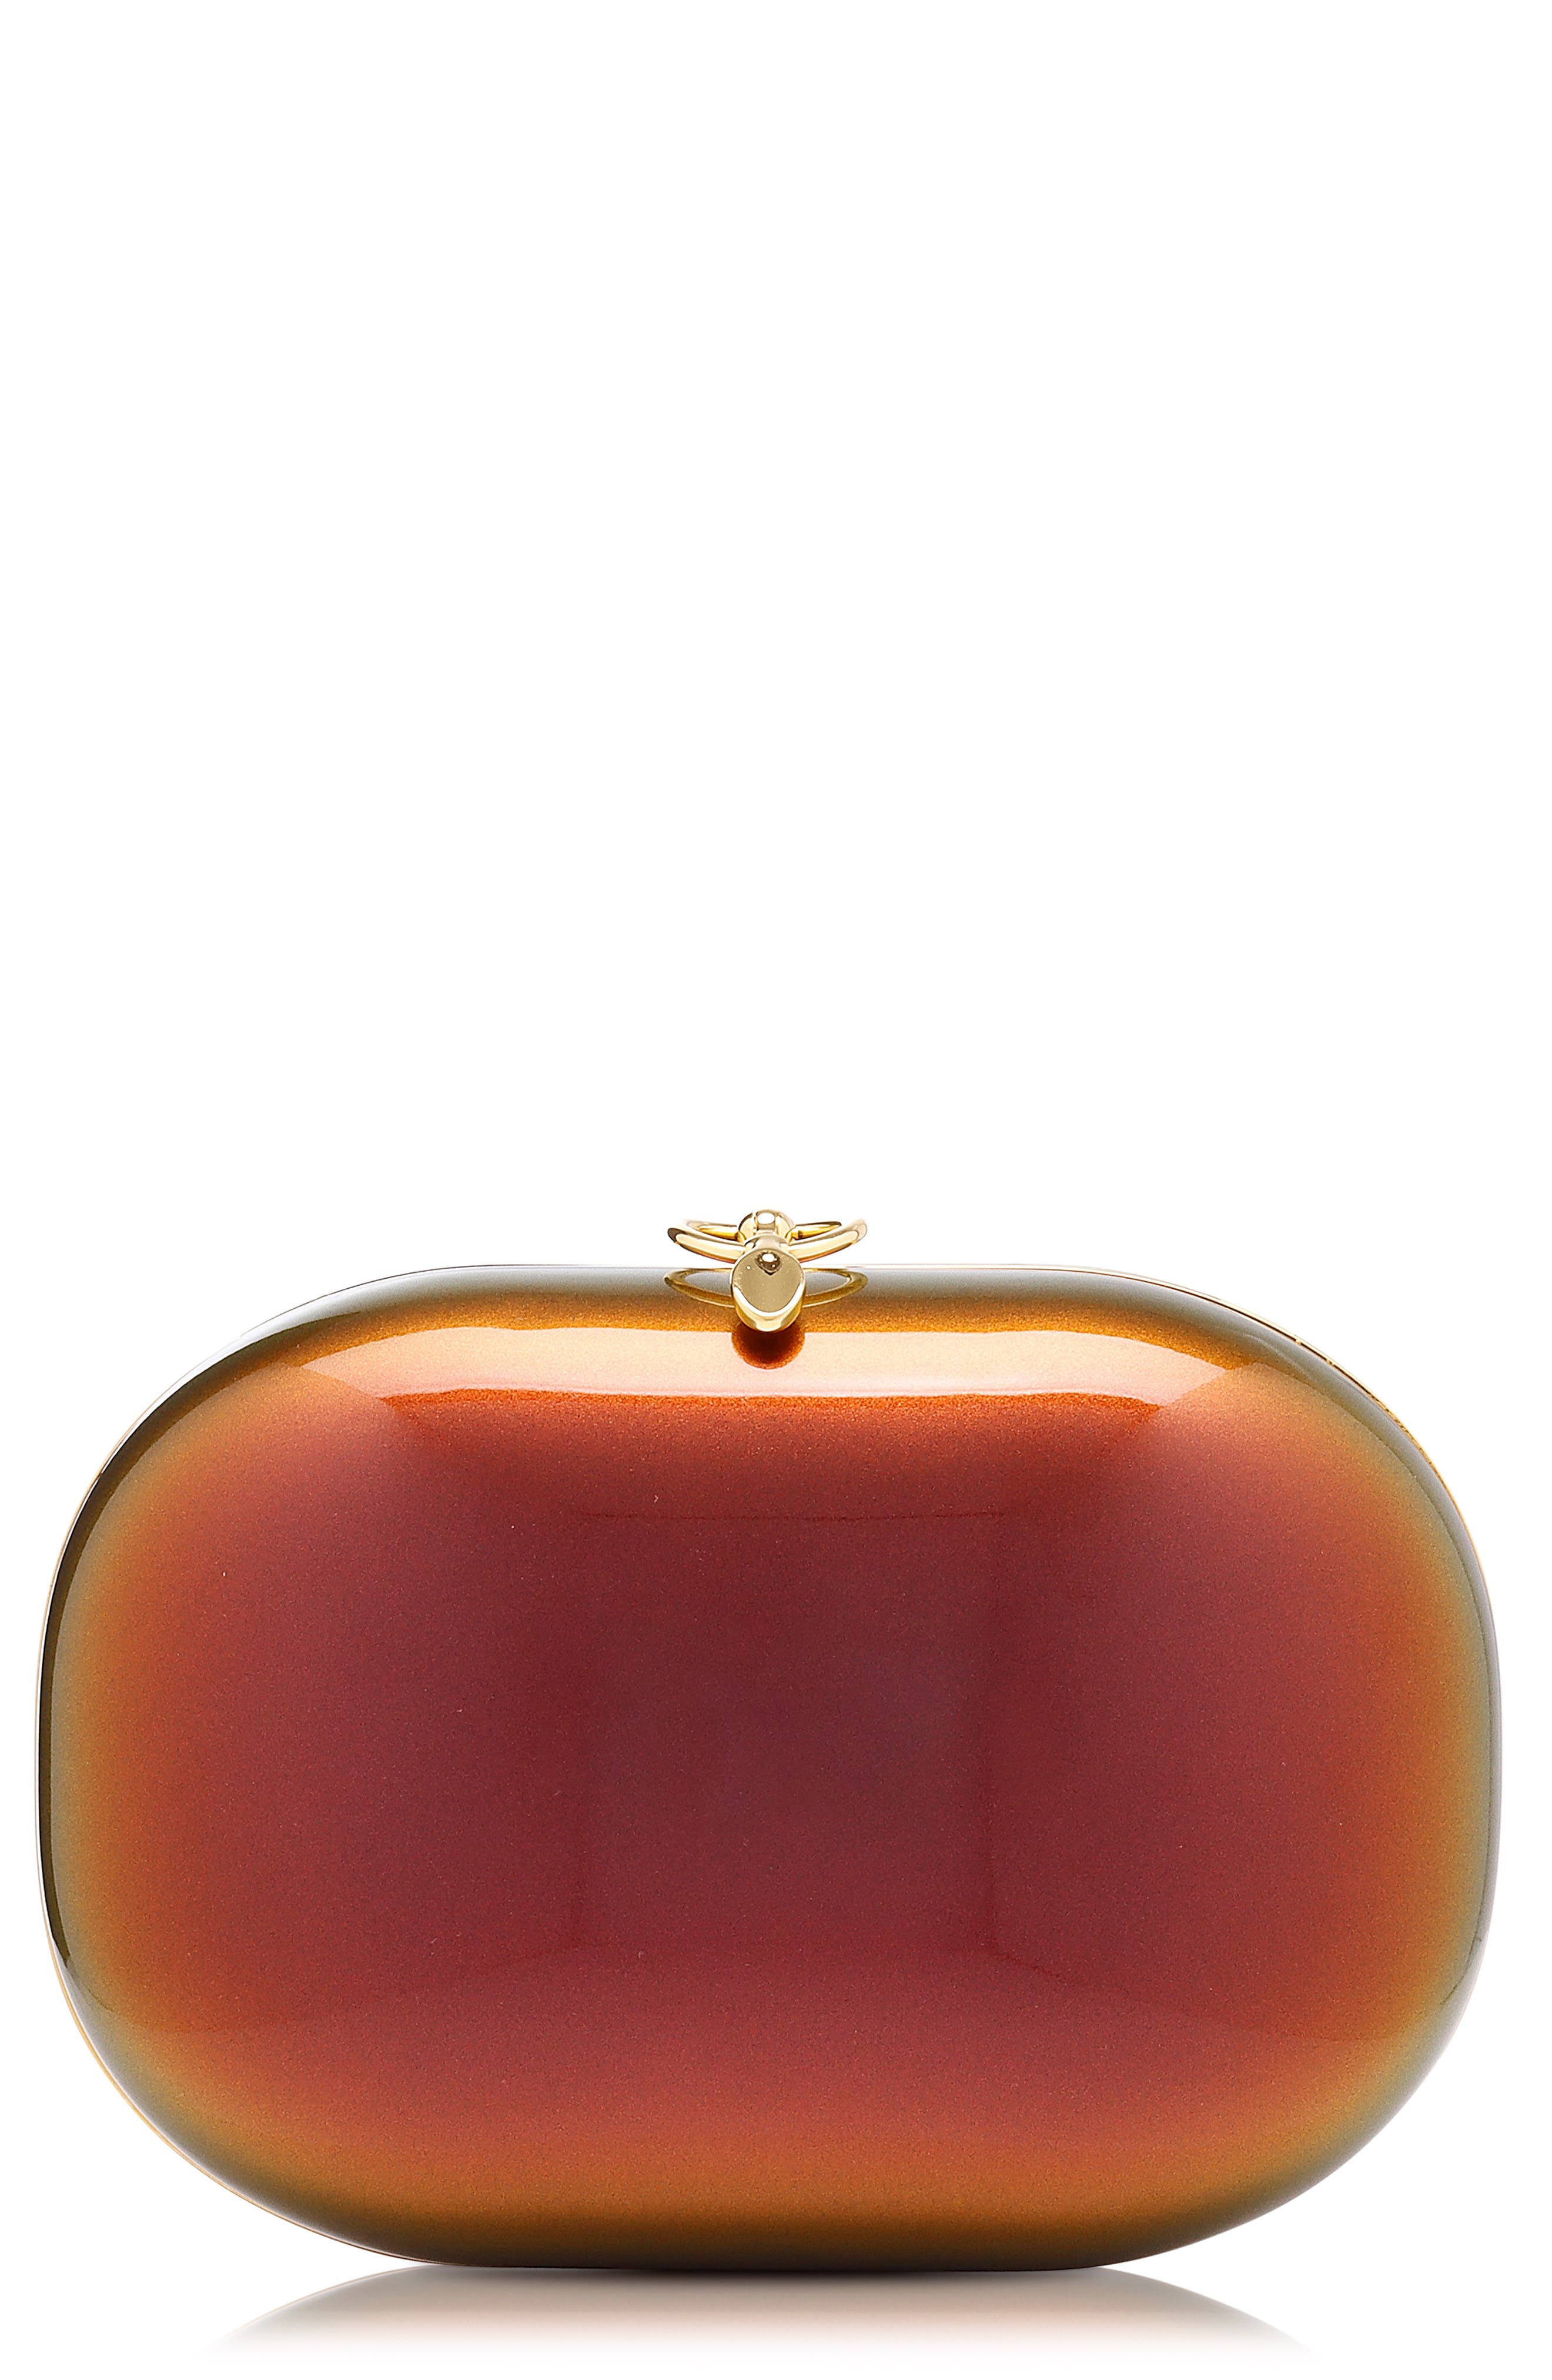 Elina Sunset Pearl Iridescent Clutch